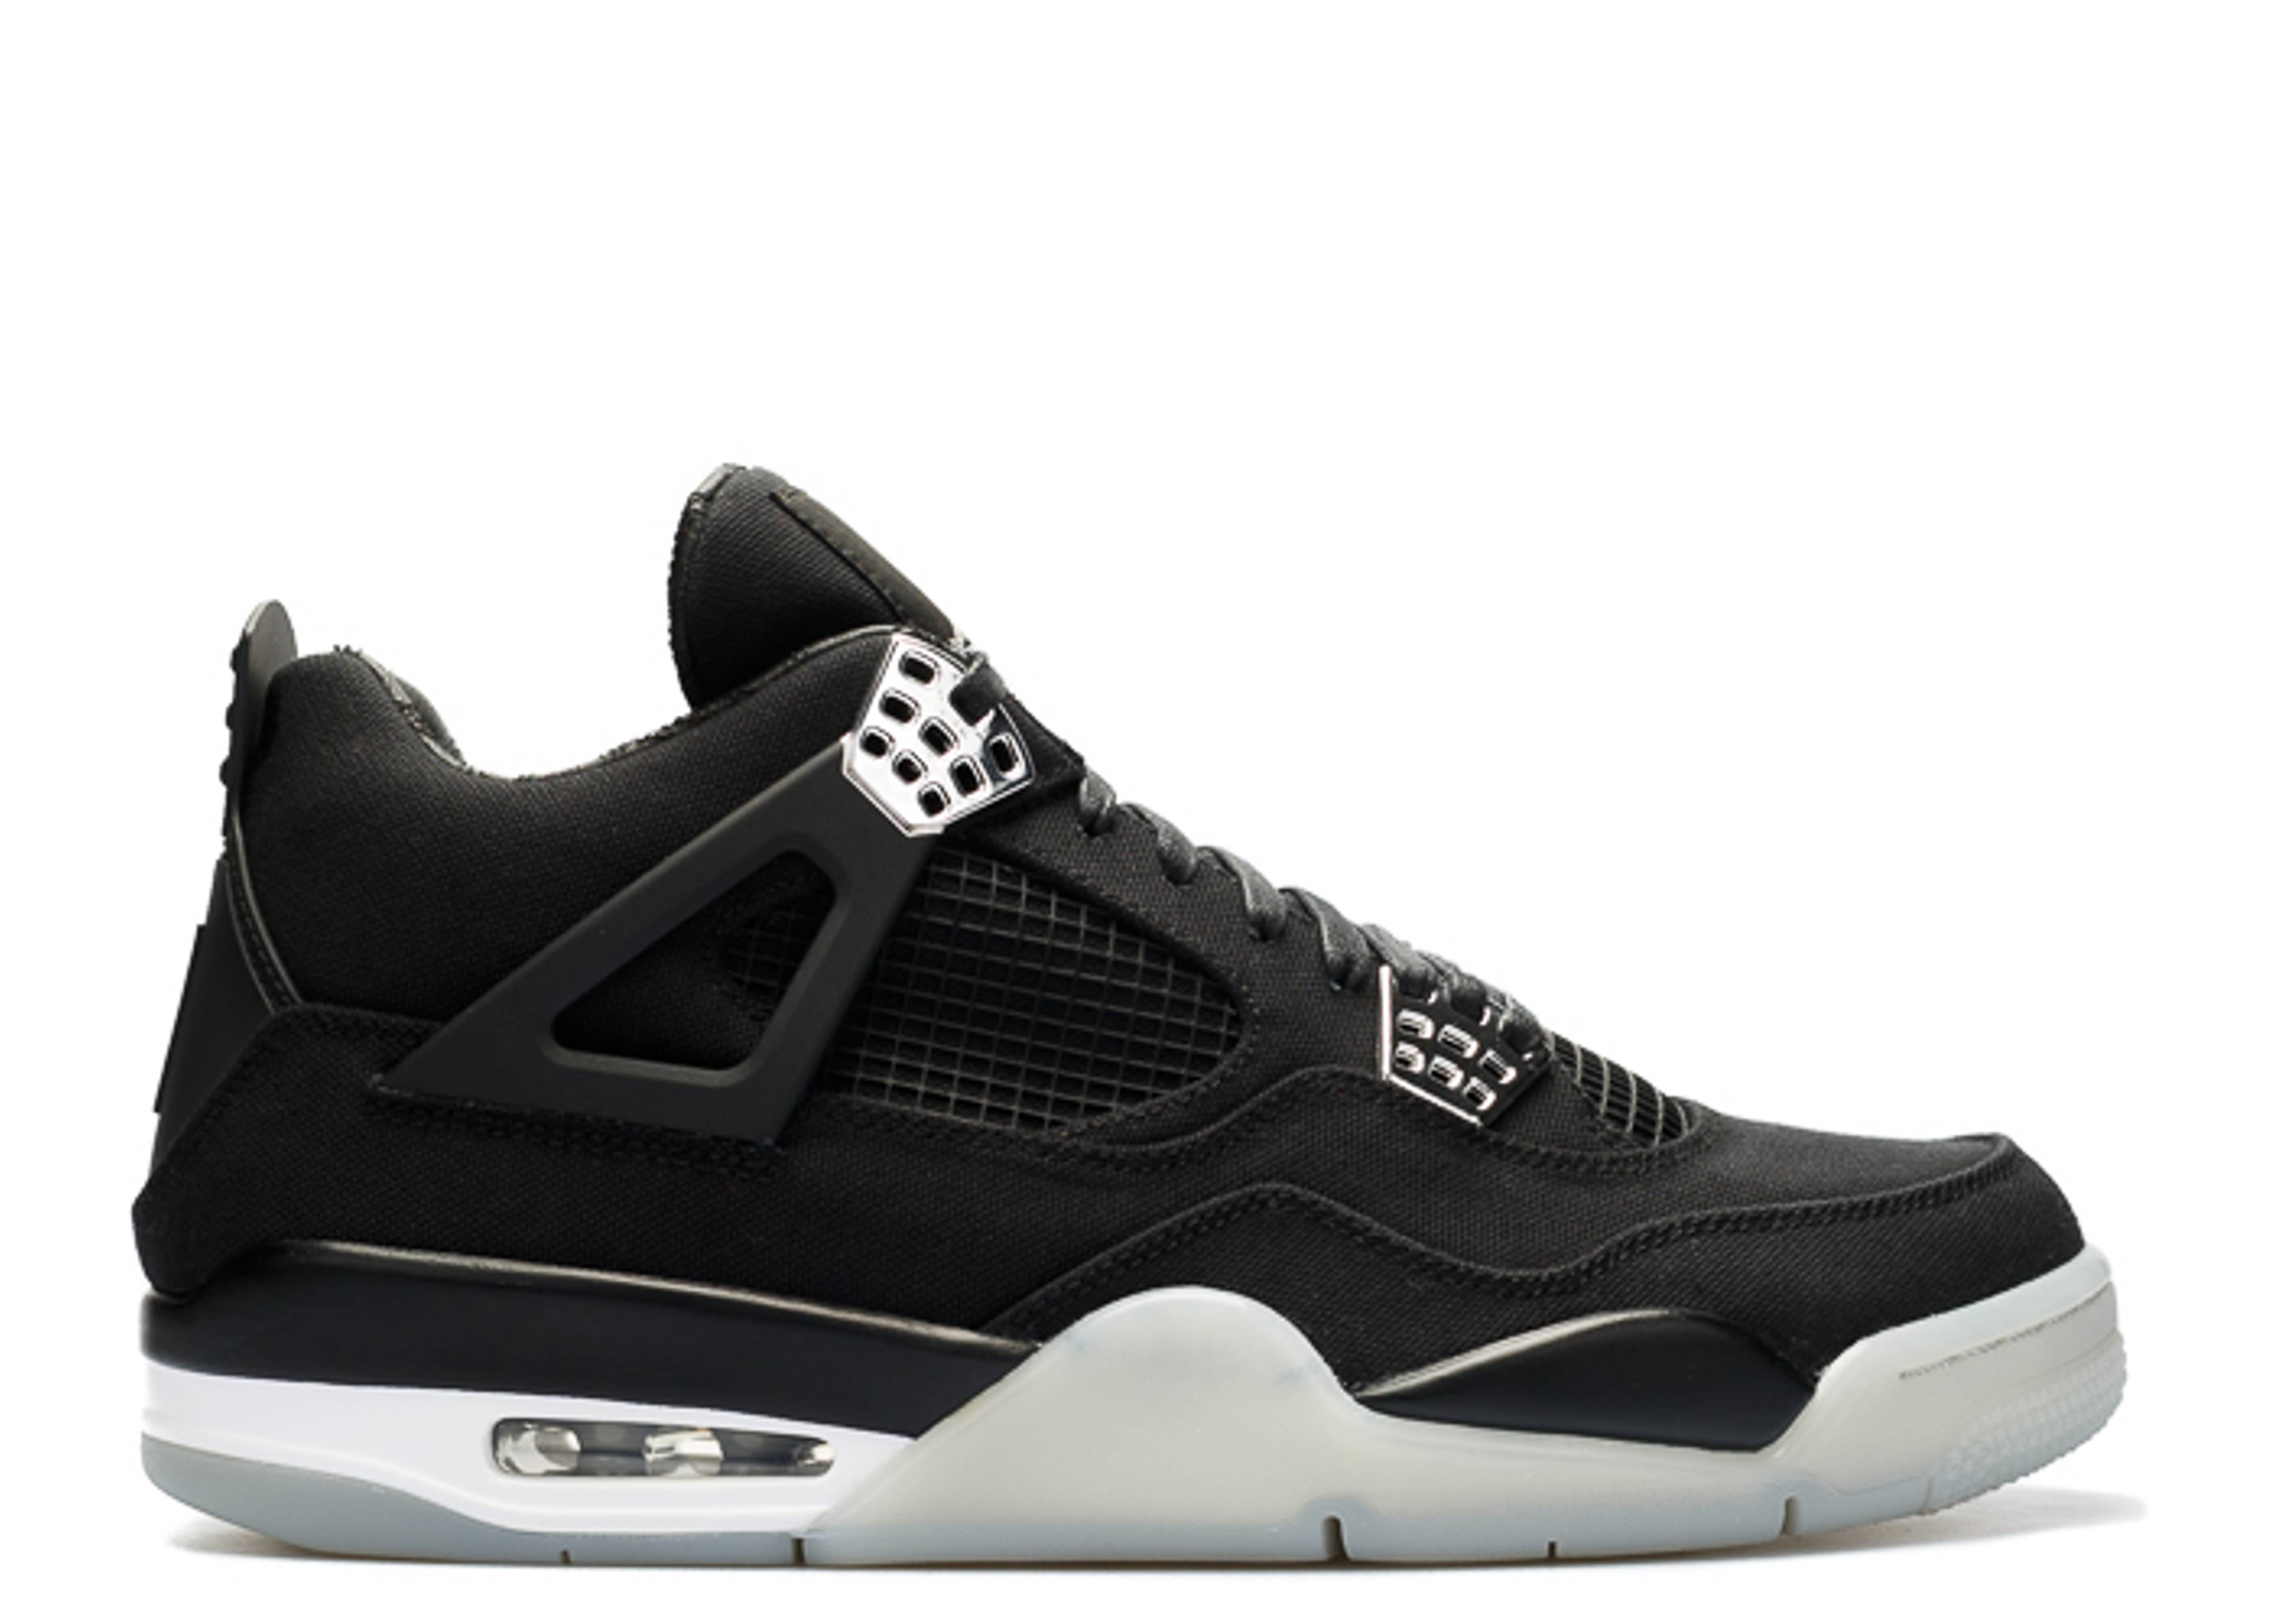 mago Hassy algun lado  Eminem X Carhartt X Air Jordan 4 'Black Chrome' - Air Jordan -  SP15-MNJDLS-879/582314 - black/white/chrome | Flight Club